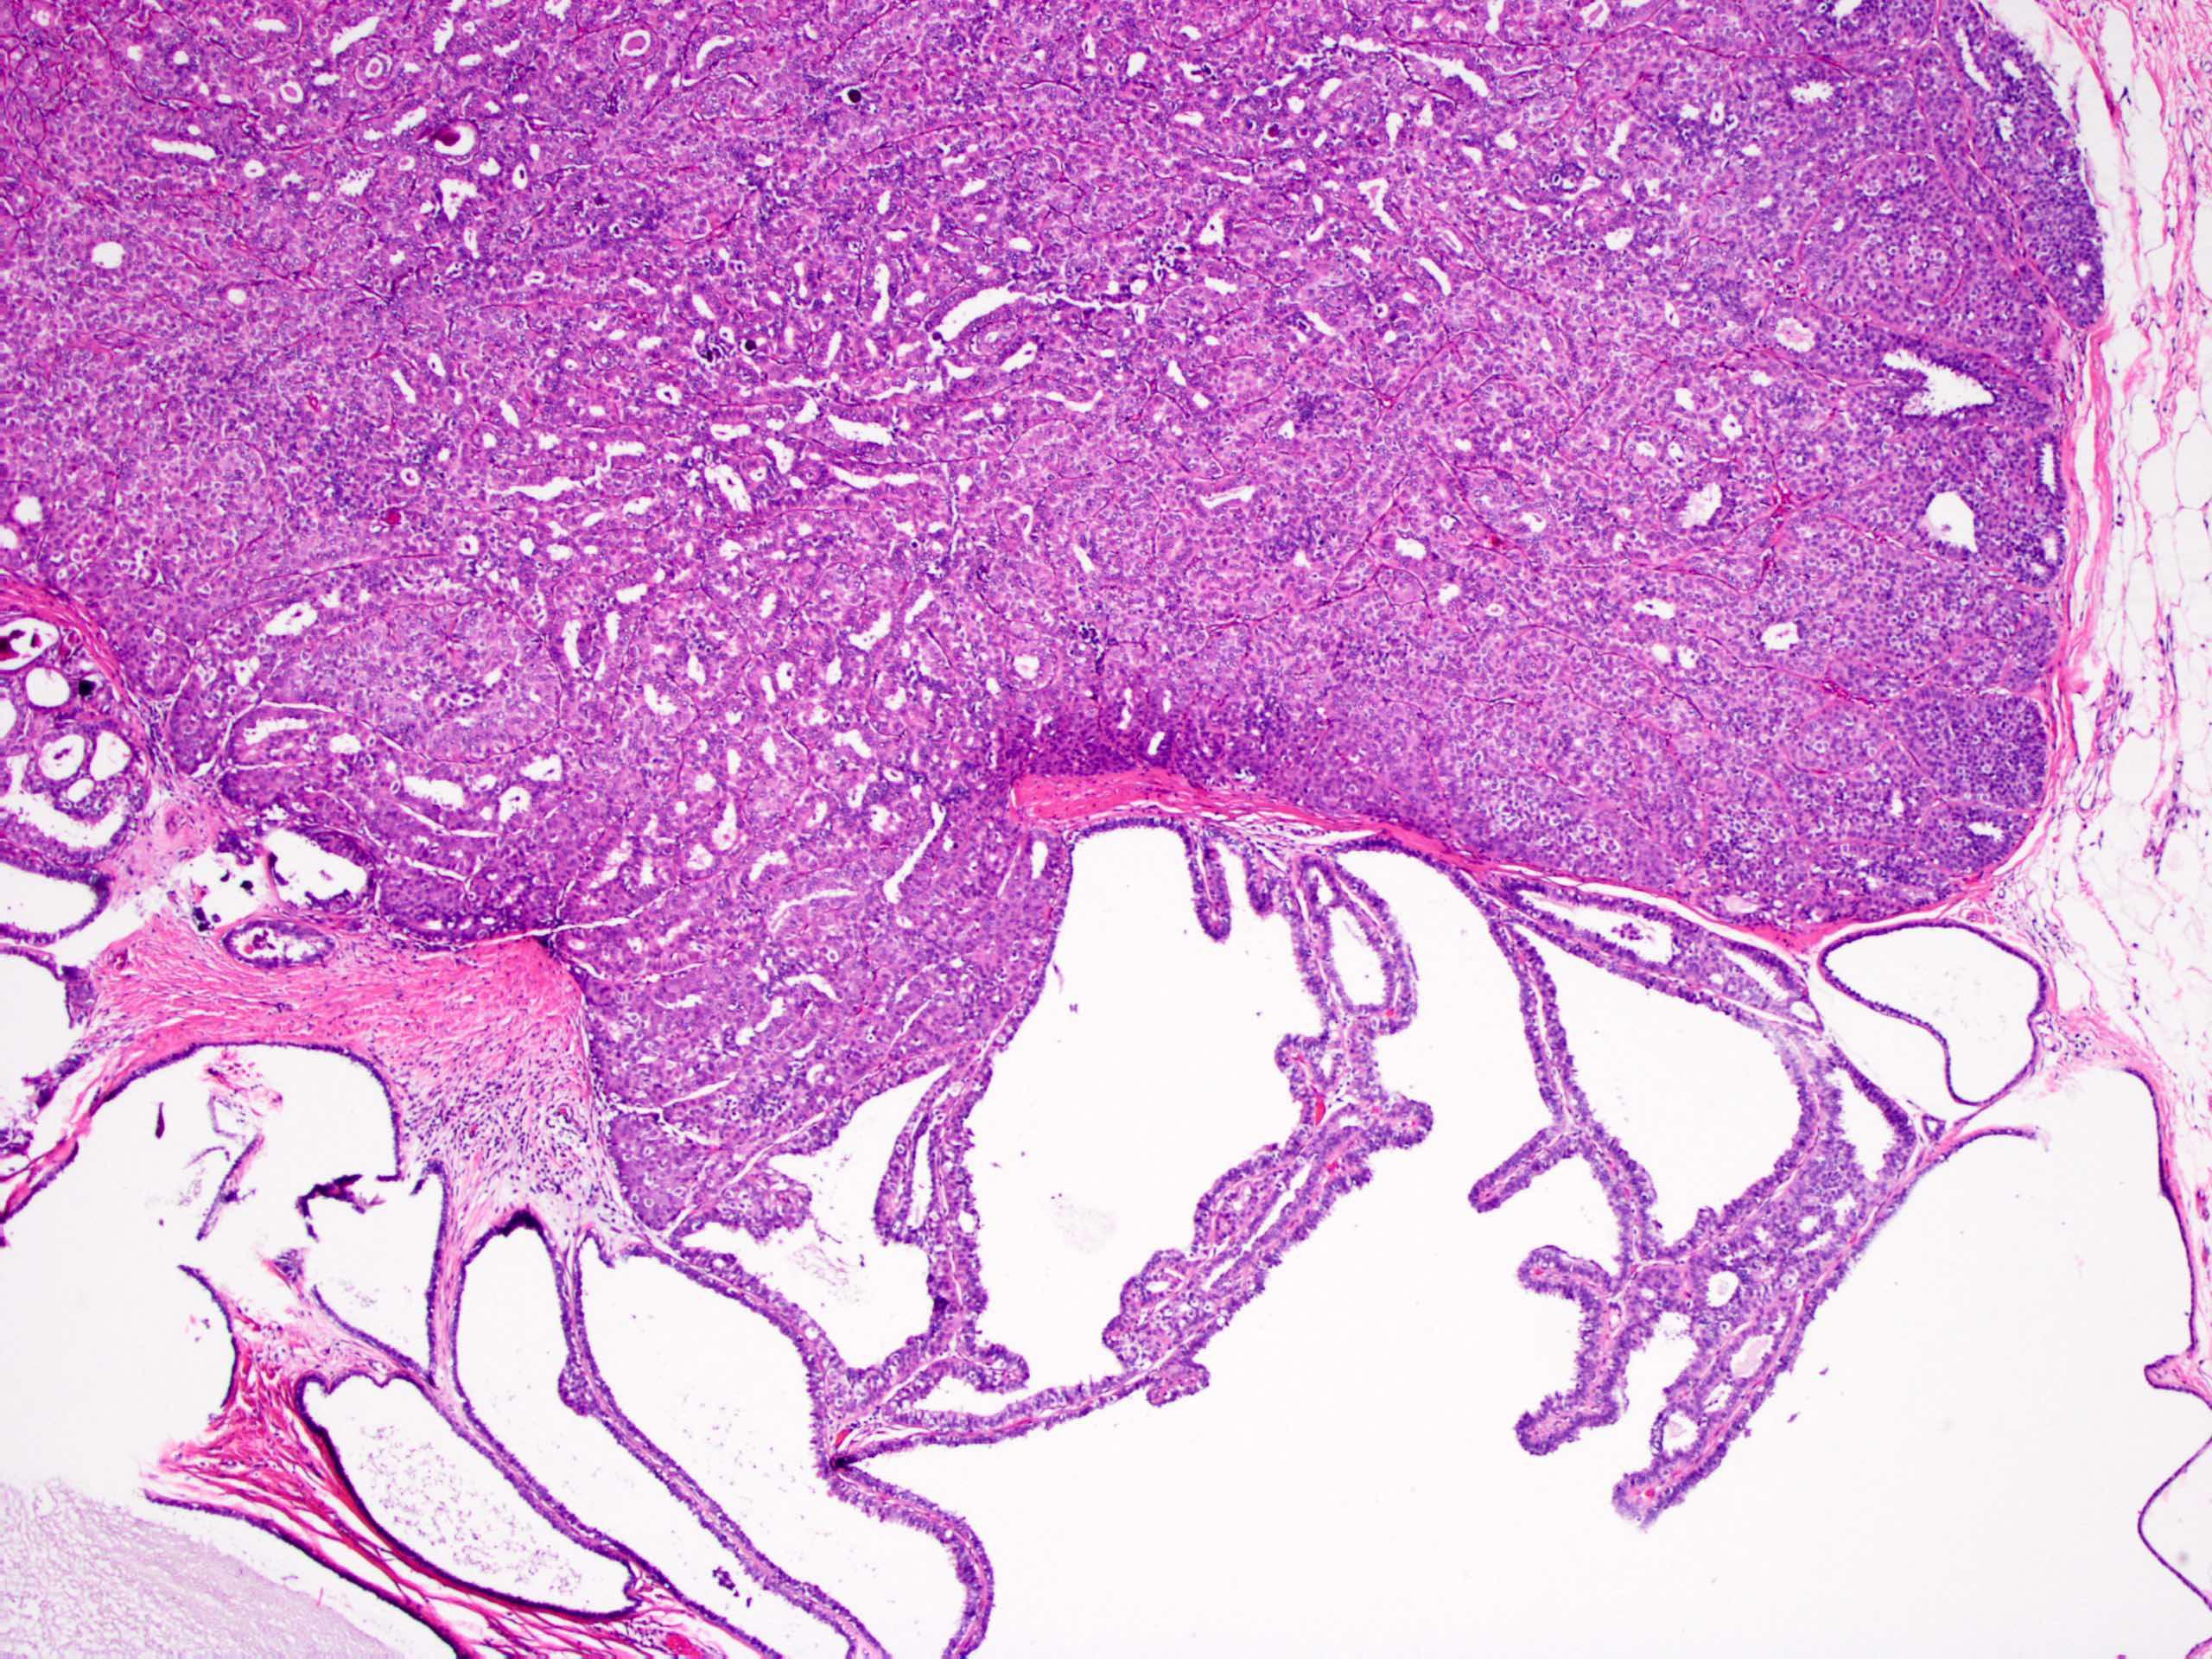 intraductalis papilloma ductalis hyperplasiaval prosztatarák hpv